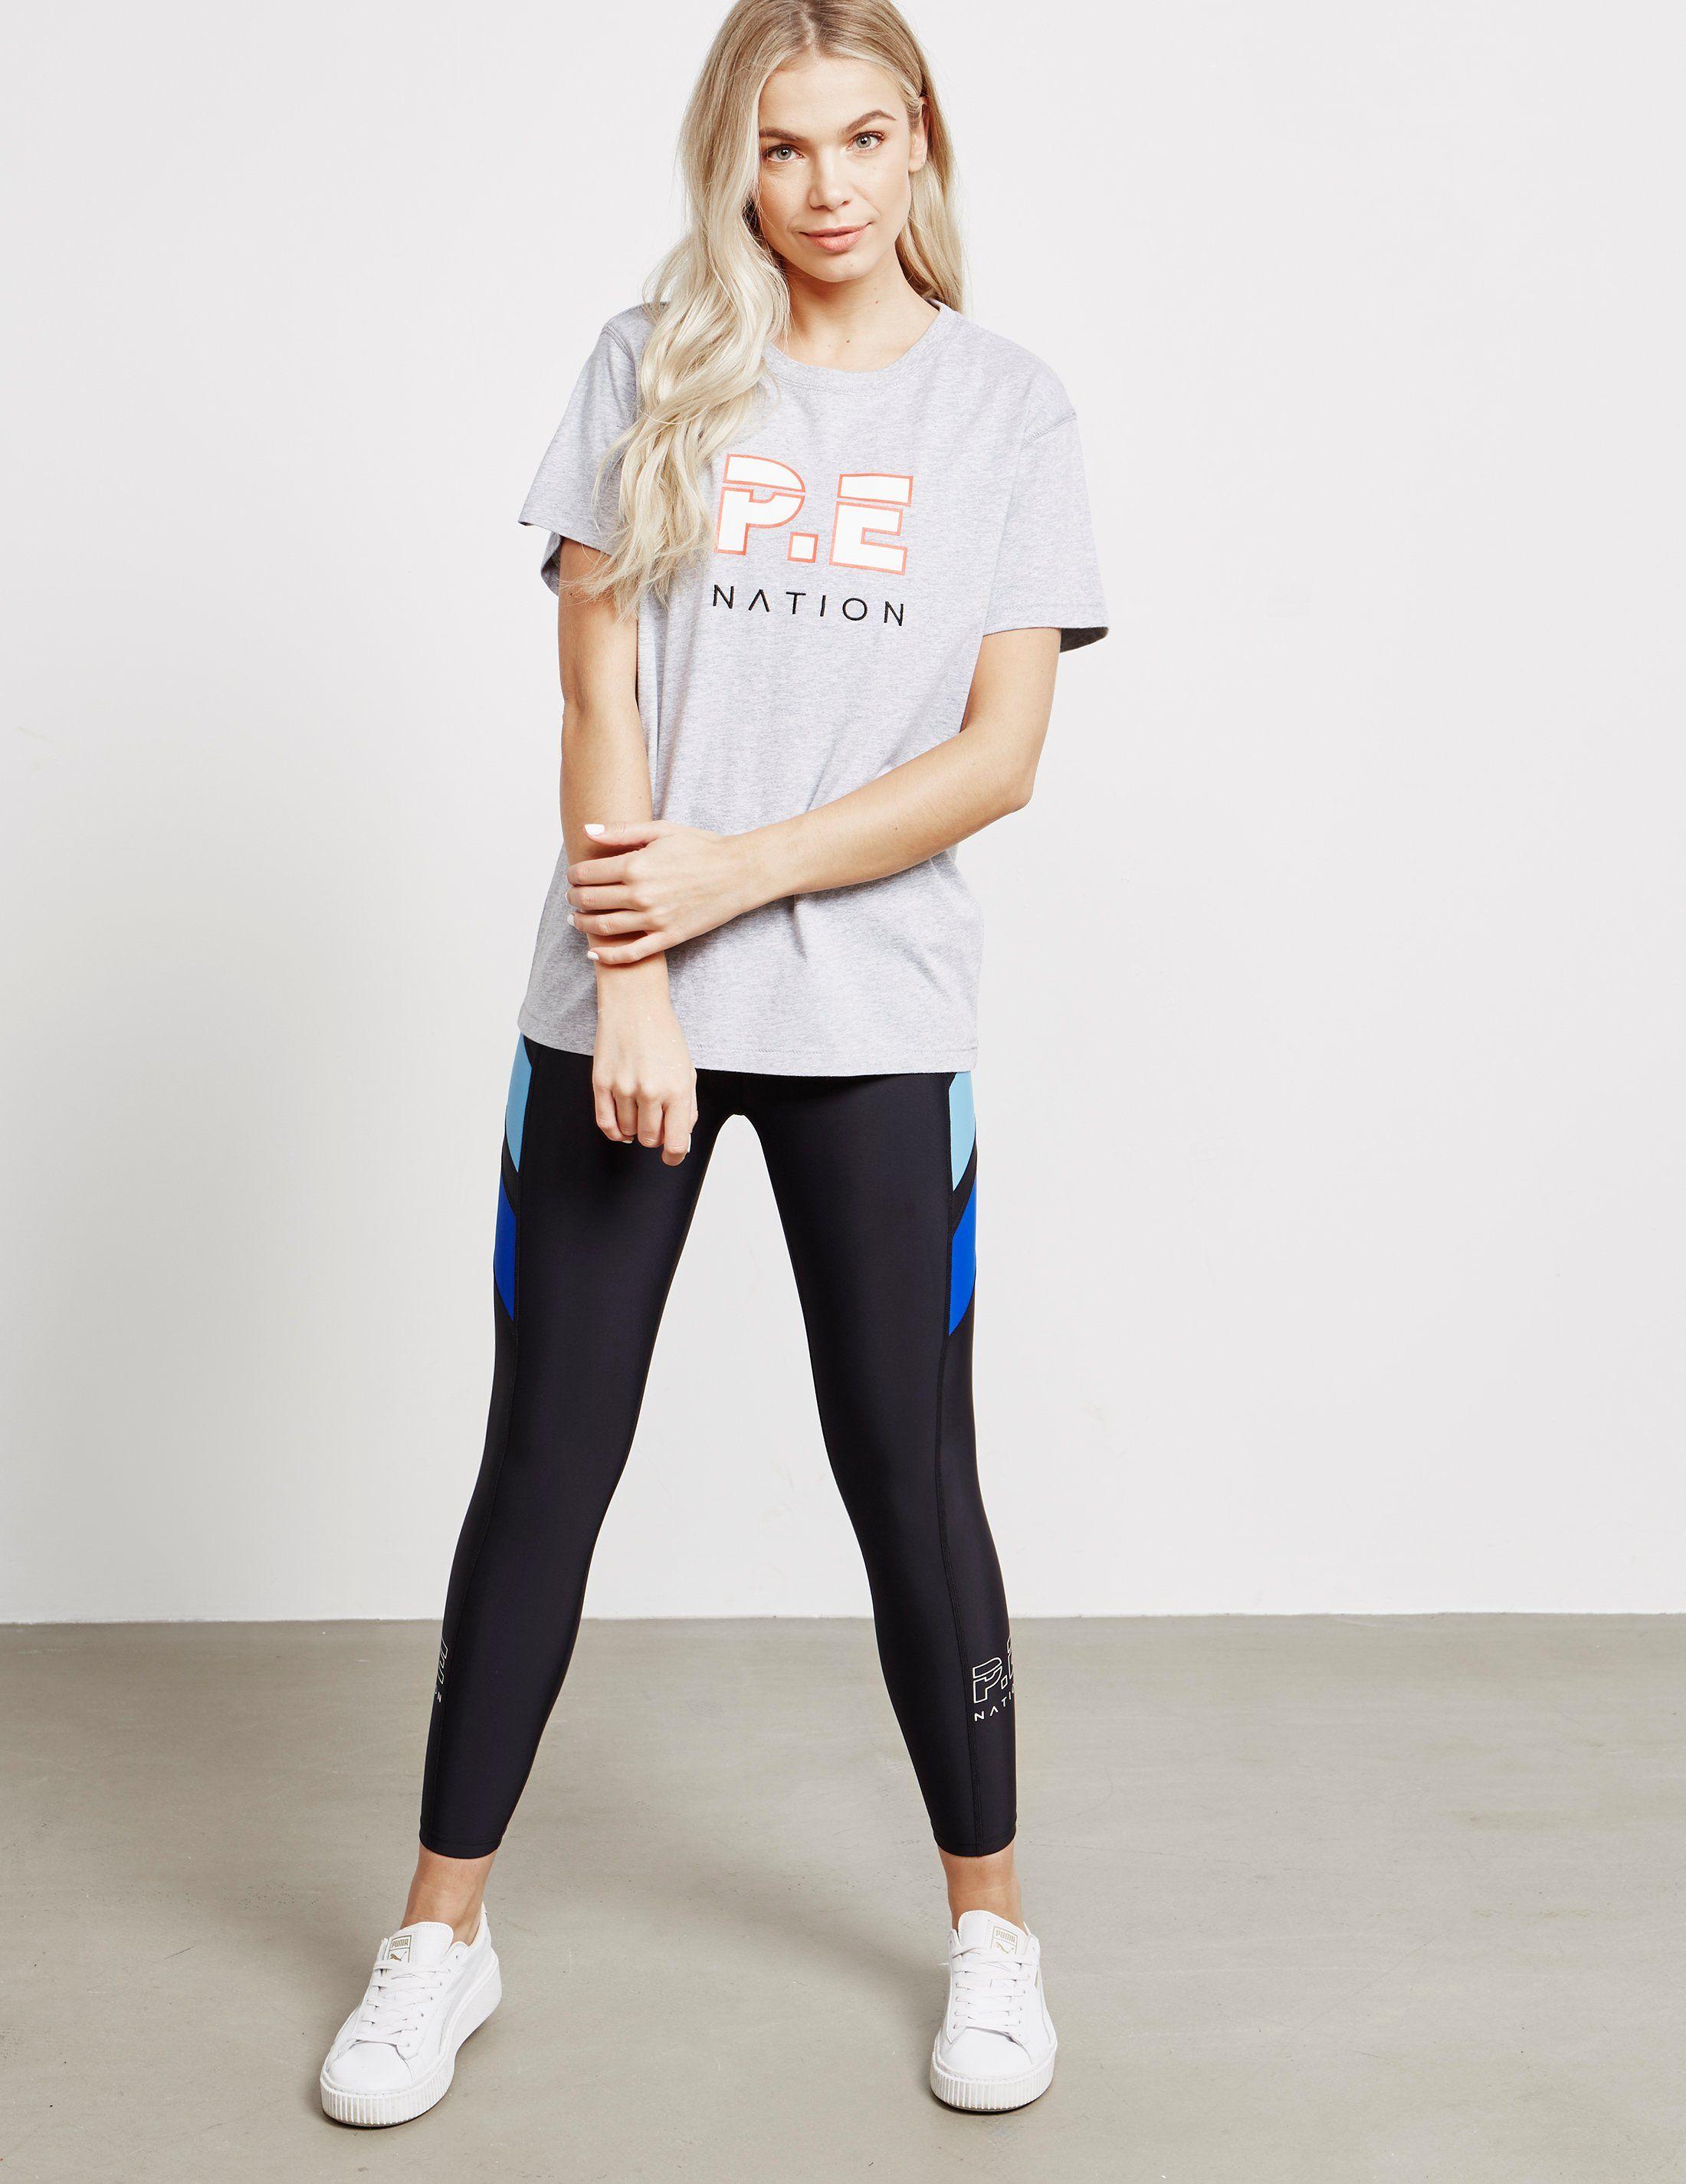 P.E Nation Double Track Short Sleeve T-Shirt